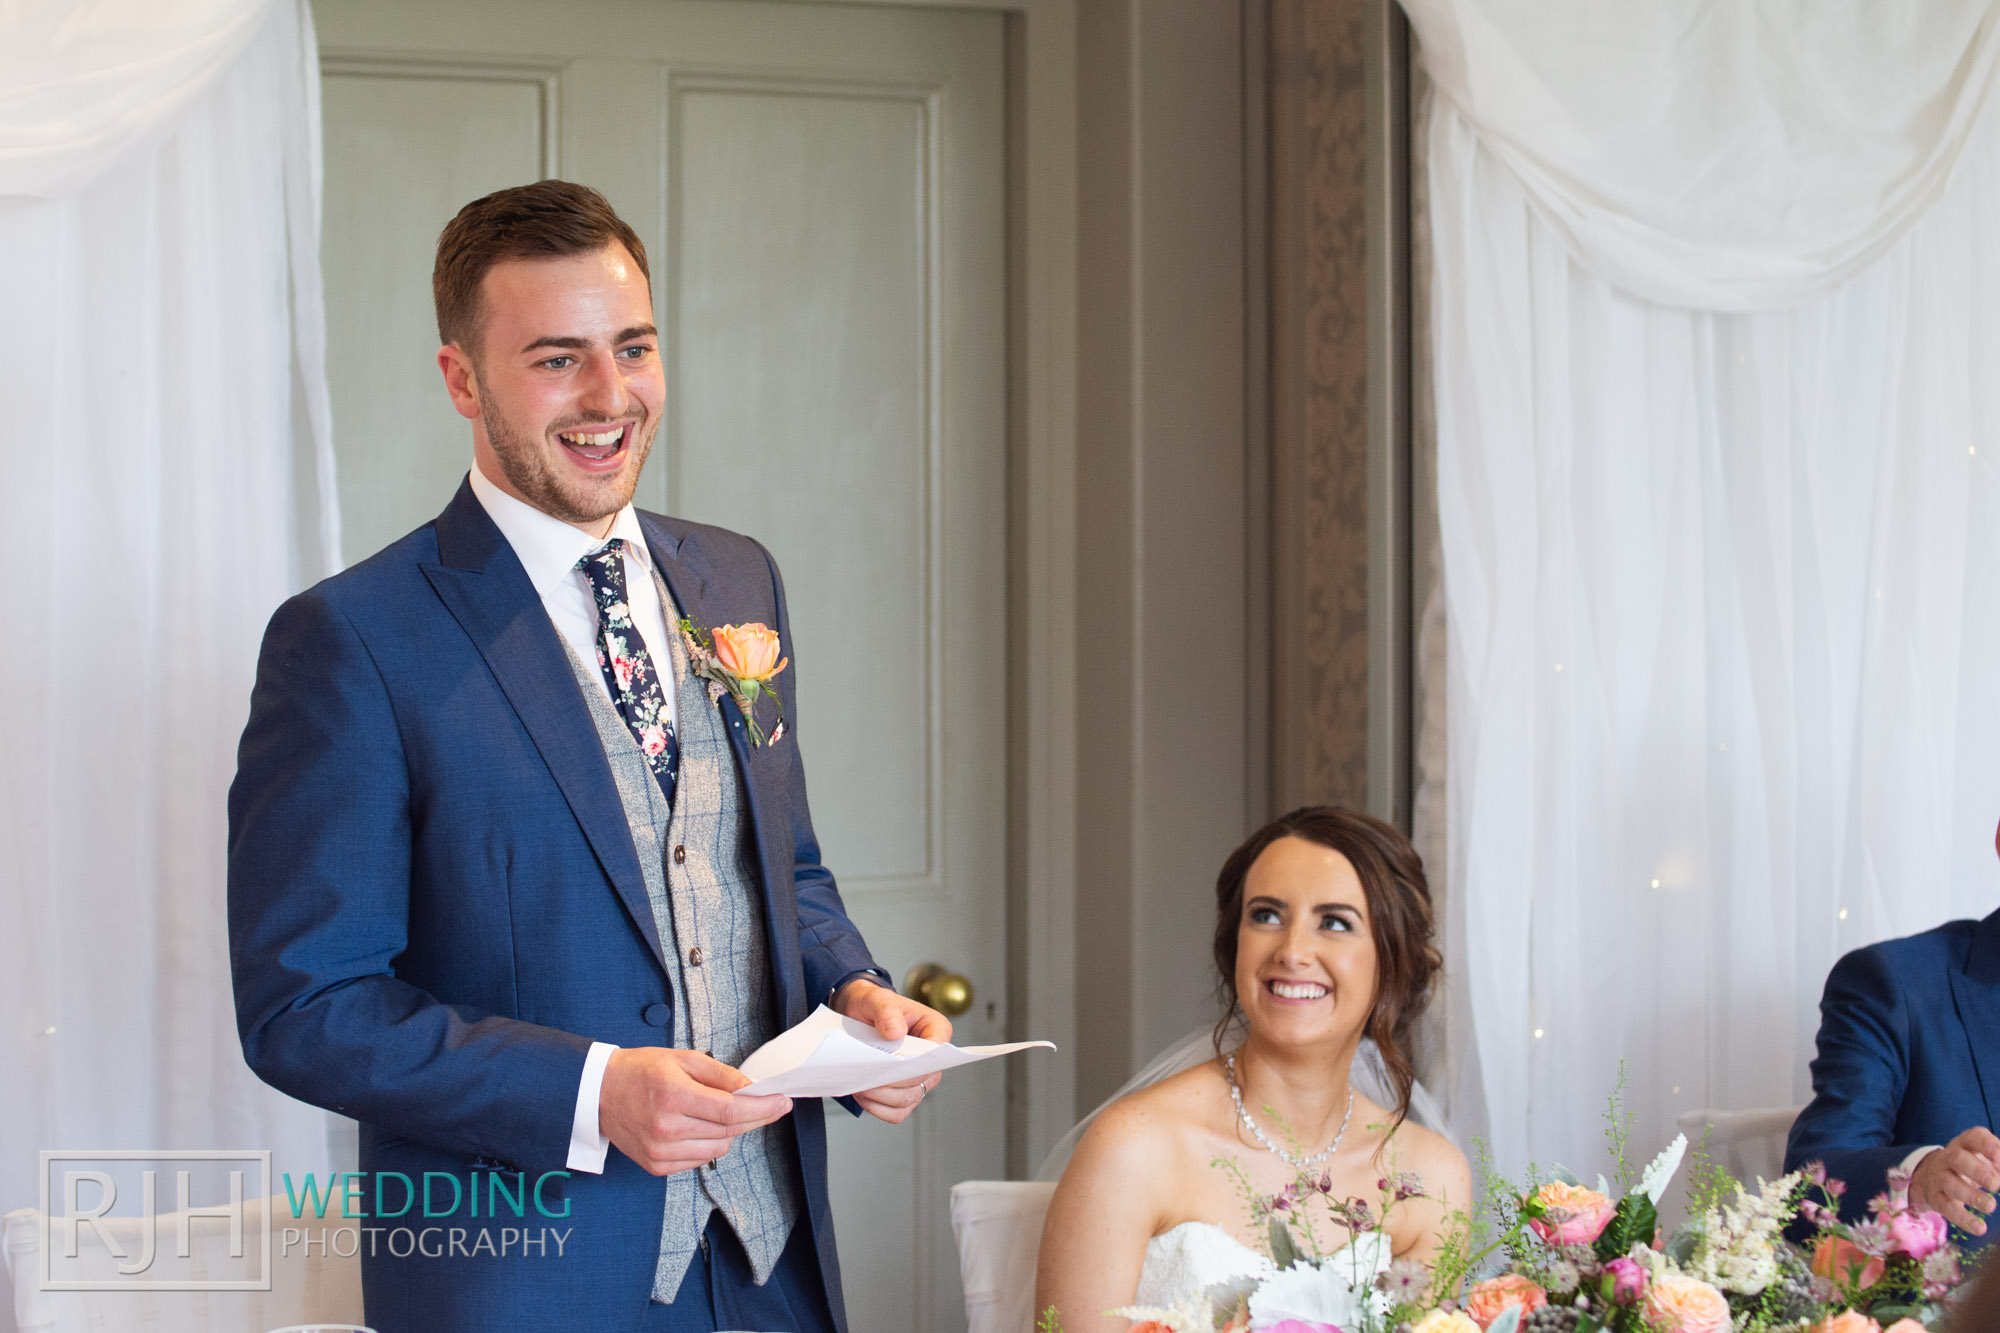 Whirlowbrook Hall Wedding Photography_Jack & Lydia_056_IMG_4528.jpg